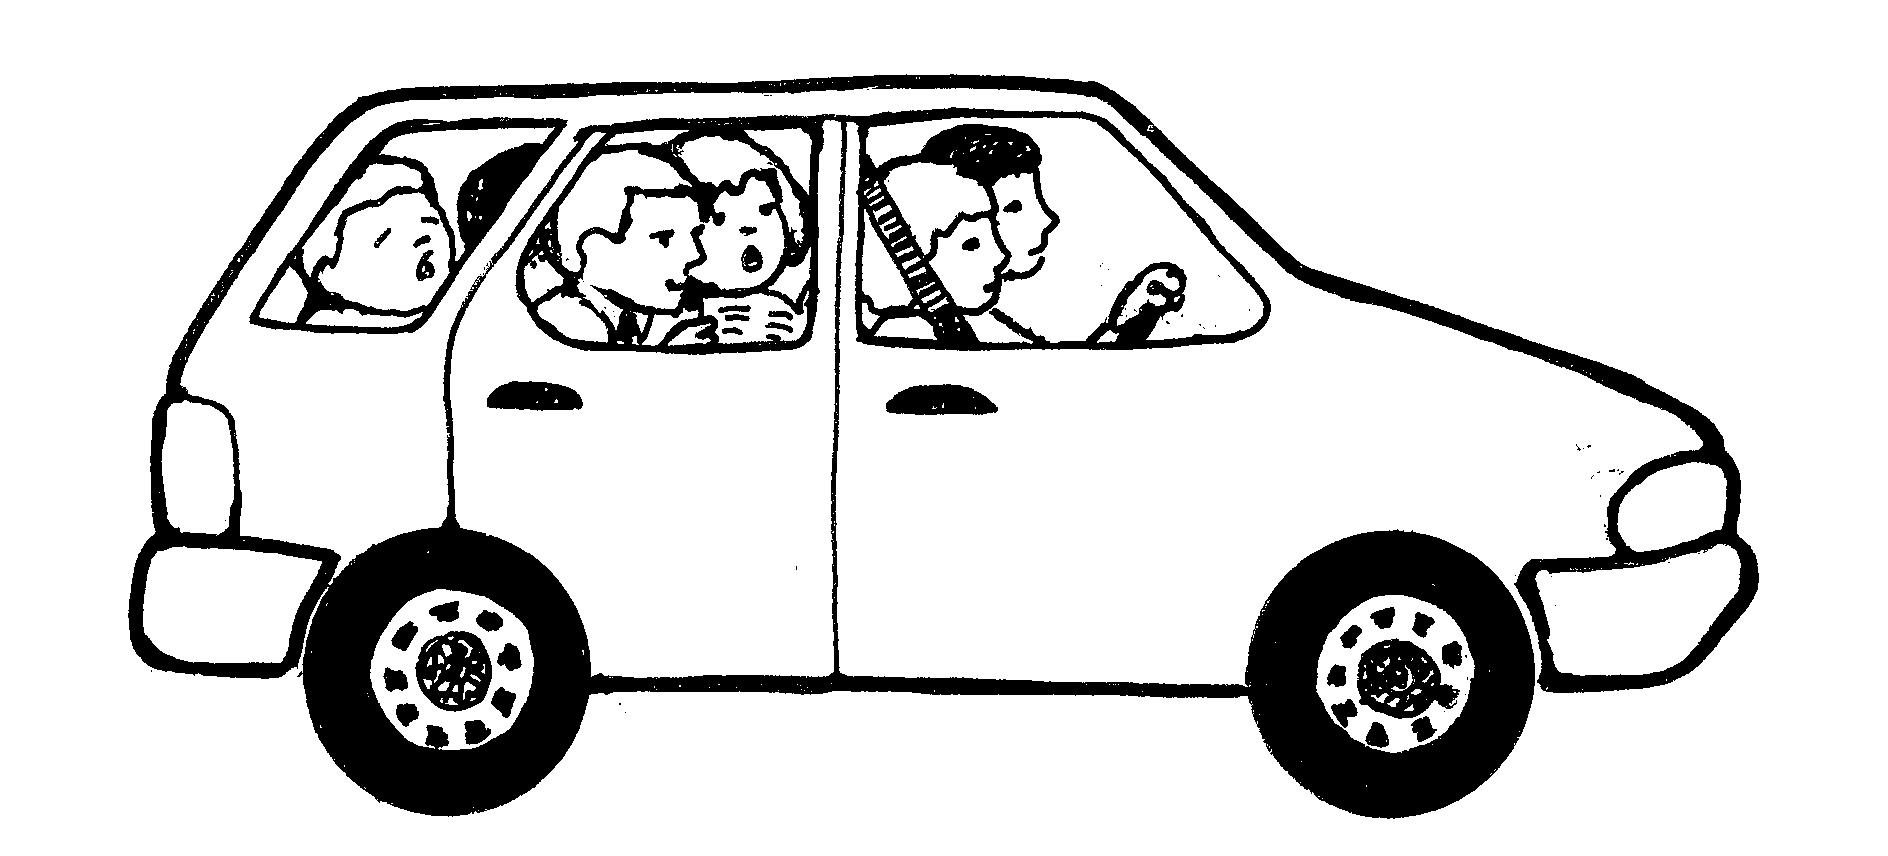 Car clipart image #497